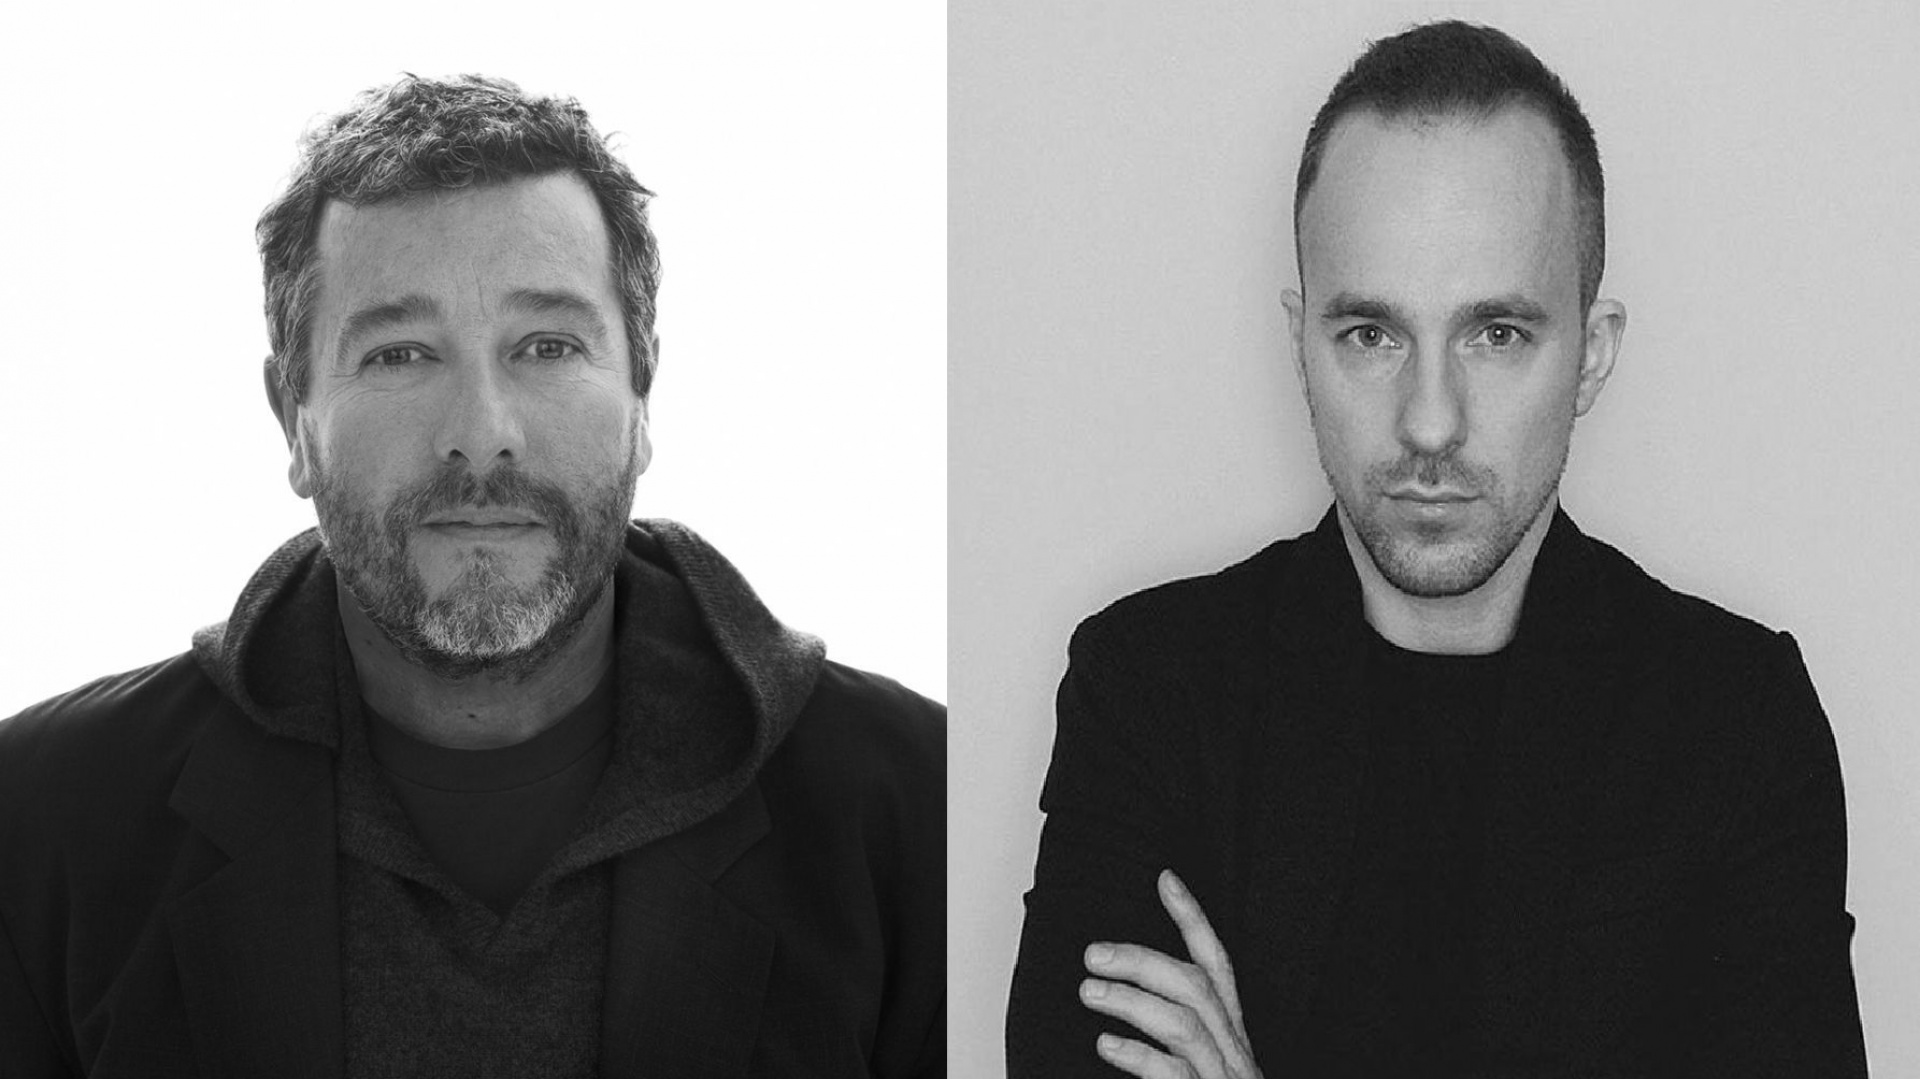 Philippe Starck i Bogusław Barnaś. Fot. Archiwum